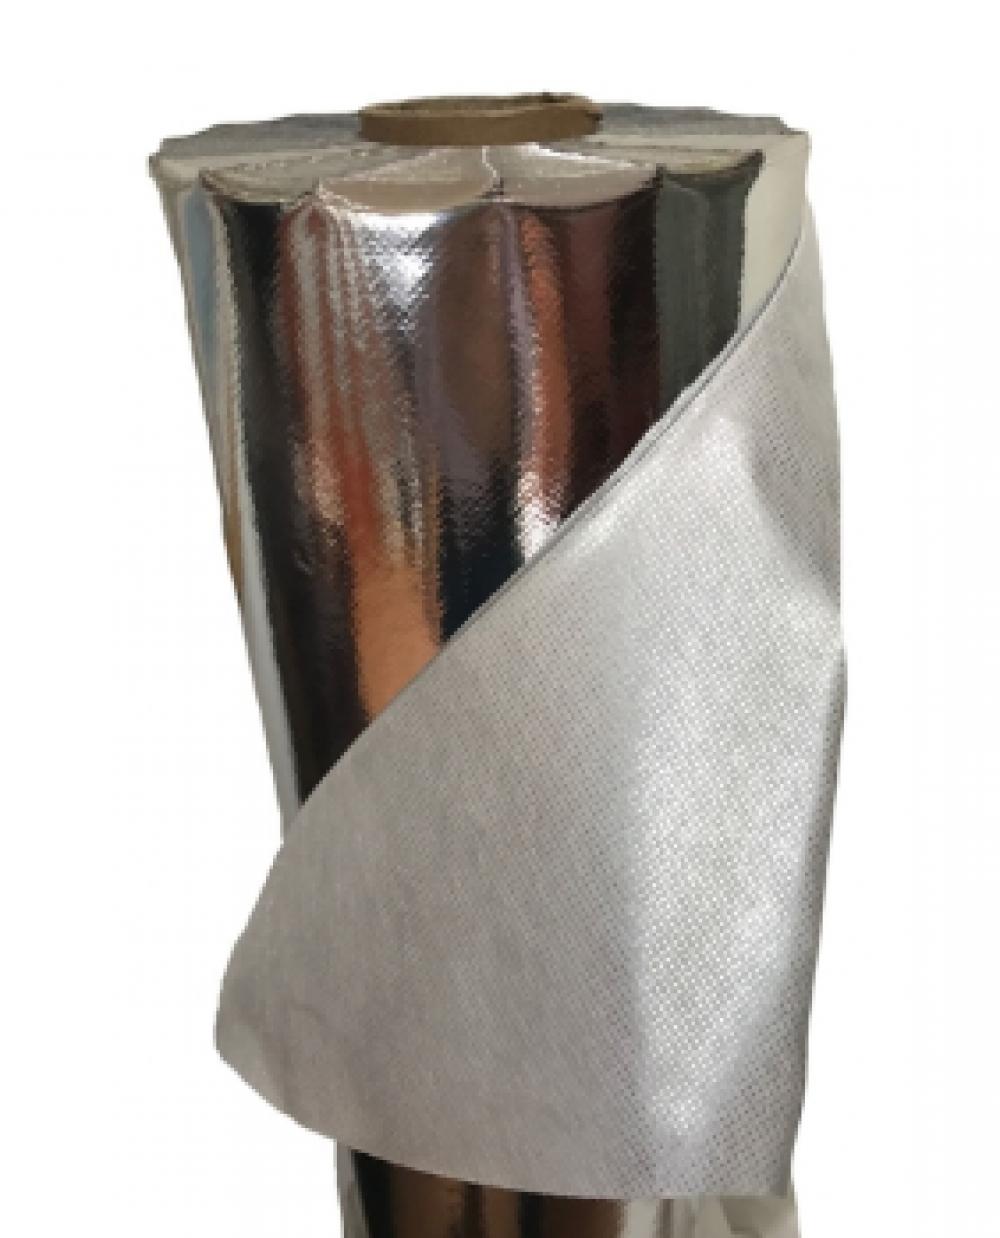 Folie aluminizata, Aluflex Reflex, 50m x 1.5m, rola 75 mp